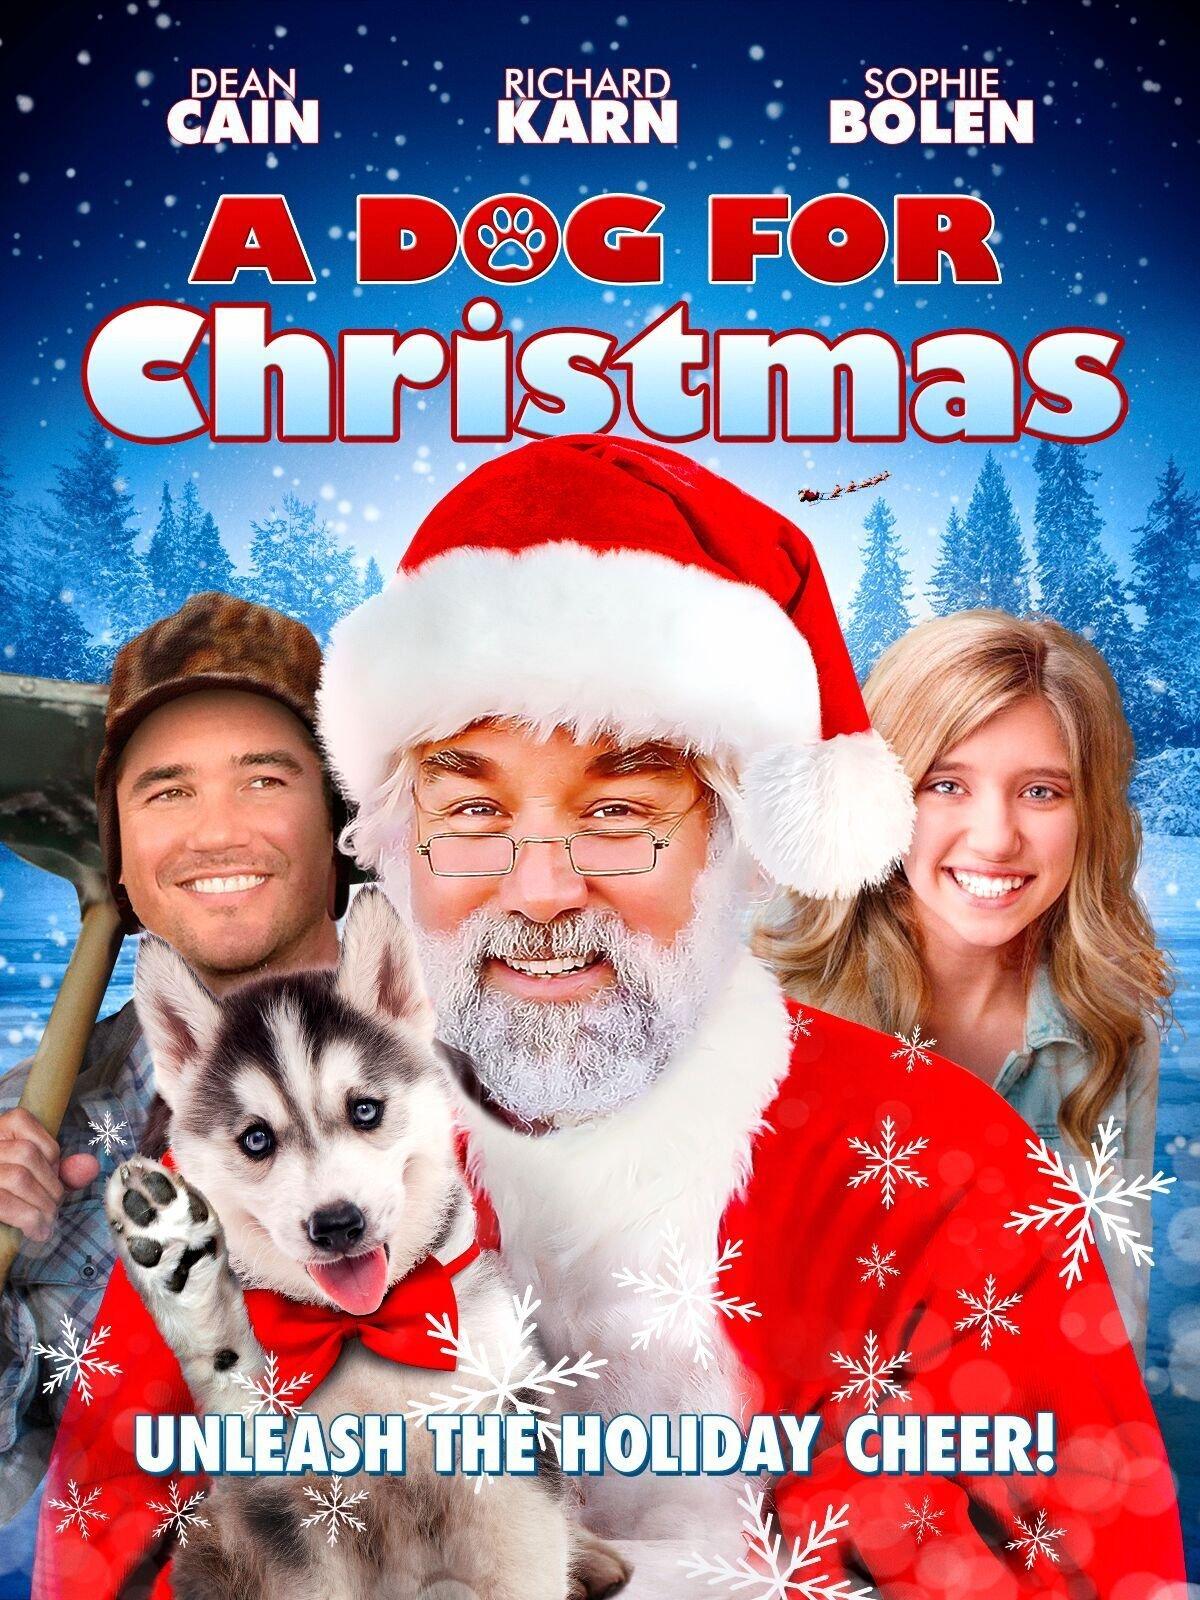 Dean Cain, Richard Karn, and Sophie Bolen in A Dog for Christmas (2015)